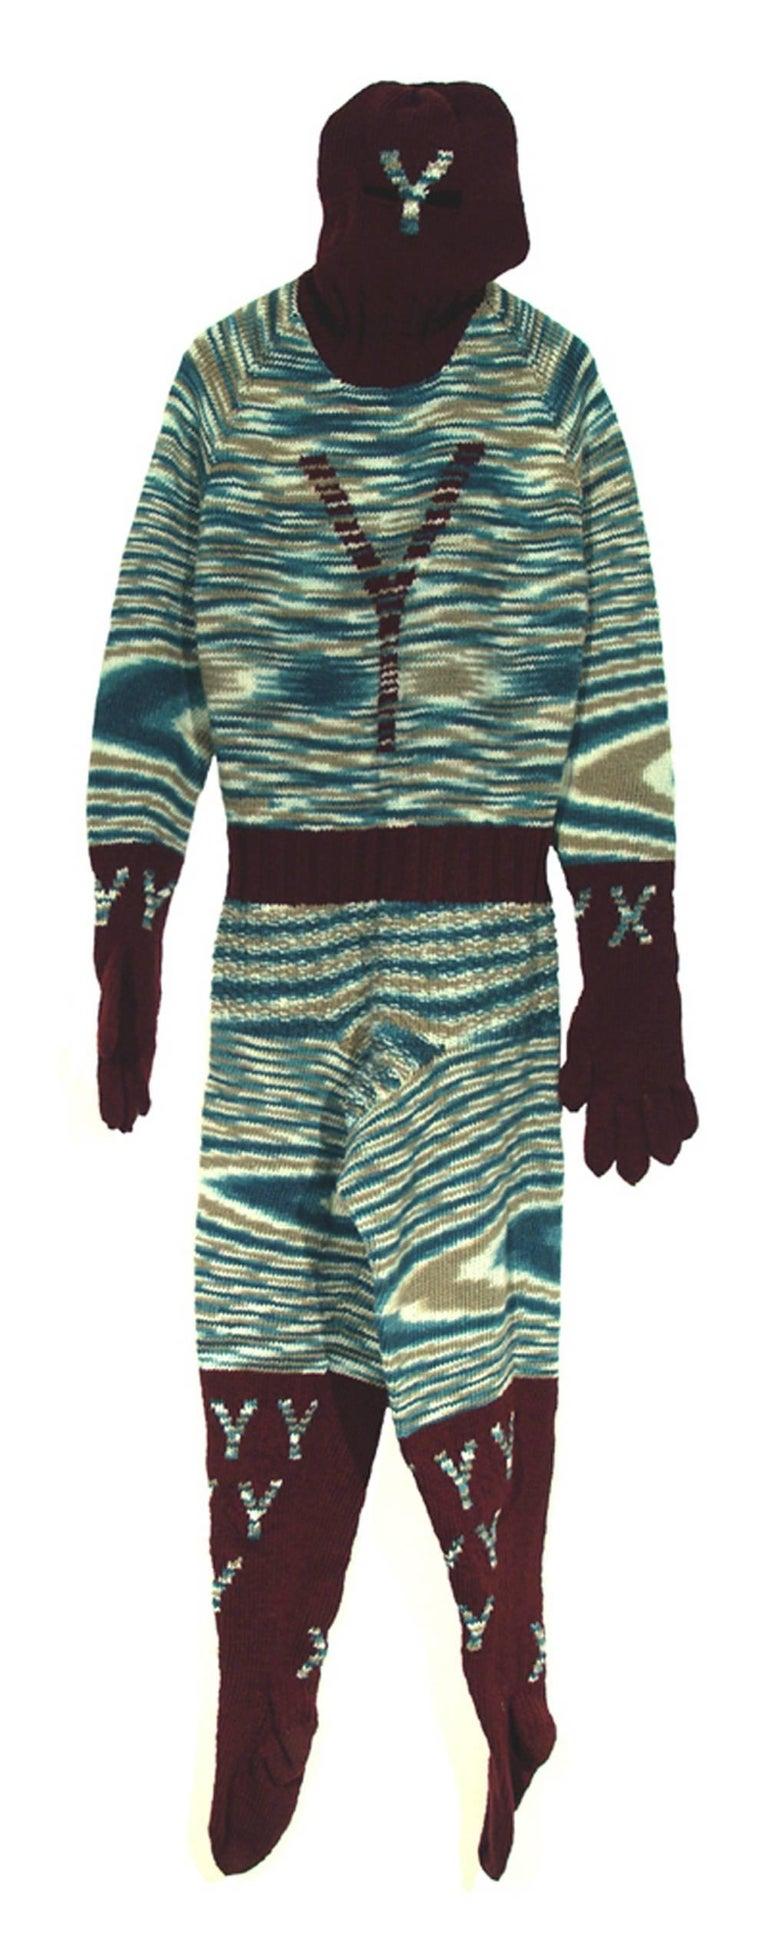 "Mark Newport Abstract Sculpture - ""Y-Man"", Contemporary, Fiber, Fabric, Sculpture, Knit, Hand Made, Pattern, Soft"